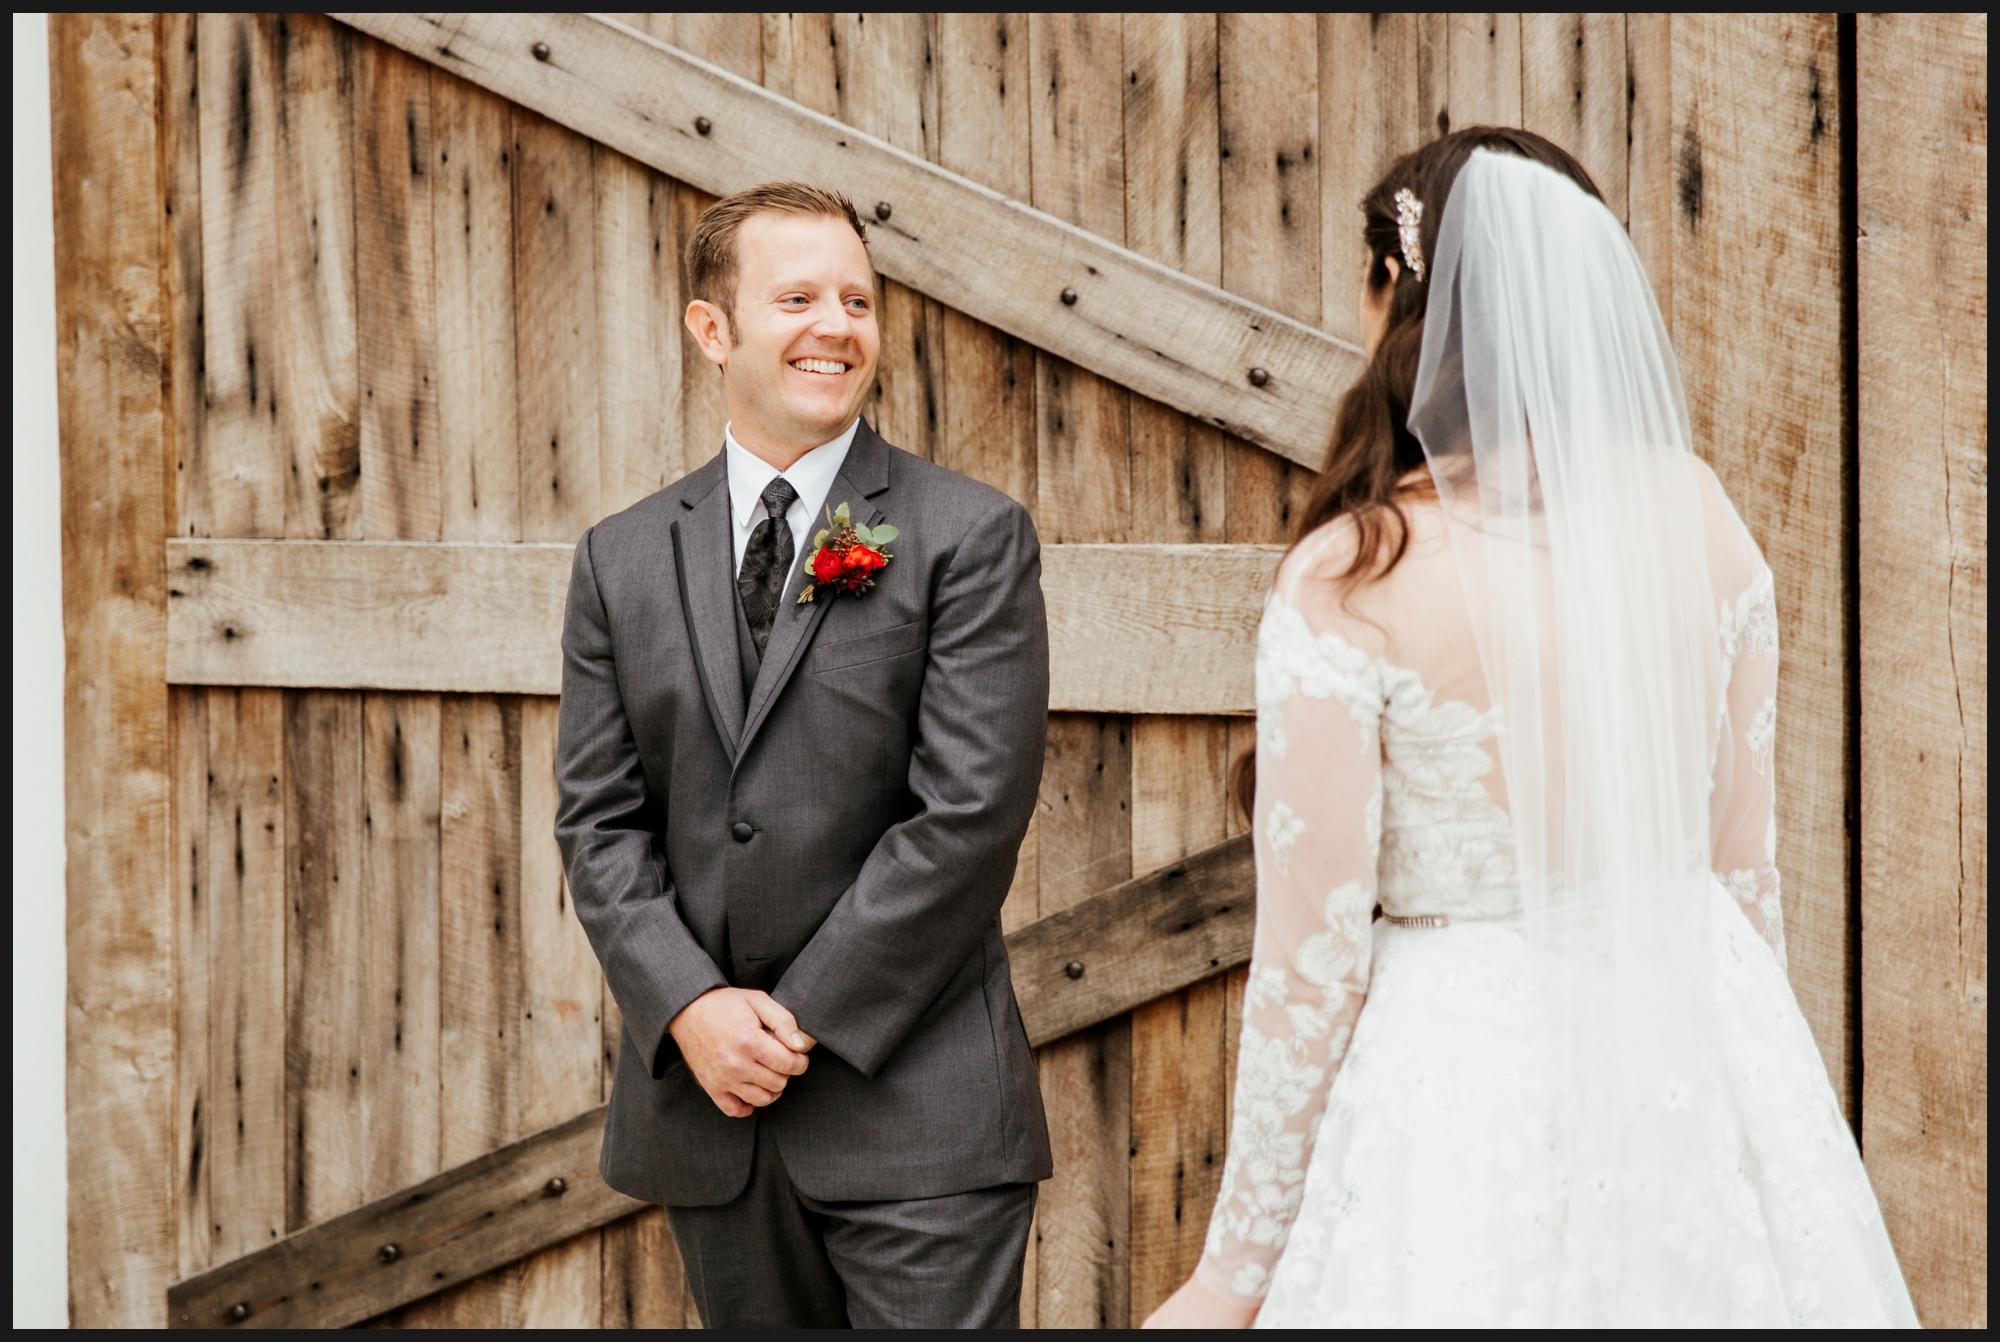 Orlando-Wedding-Photographer-destination-wedding-photographer-florida-wedding-photographer-hawaii-wedding-photographer_0506.jpg